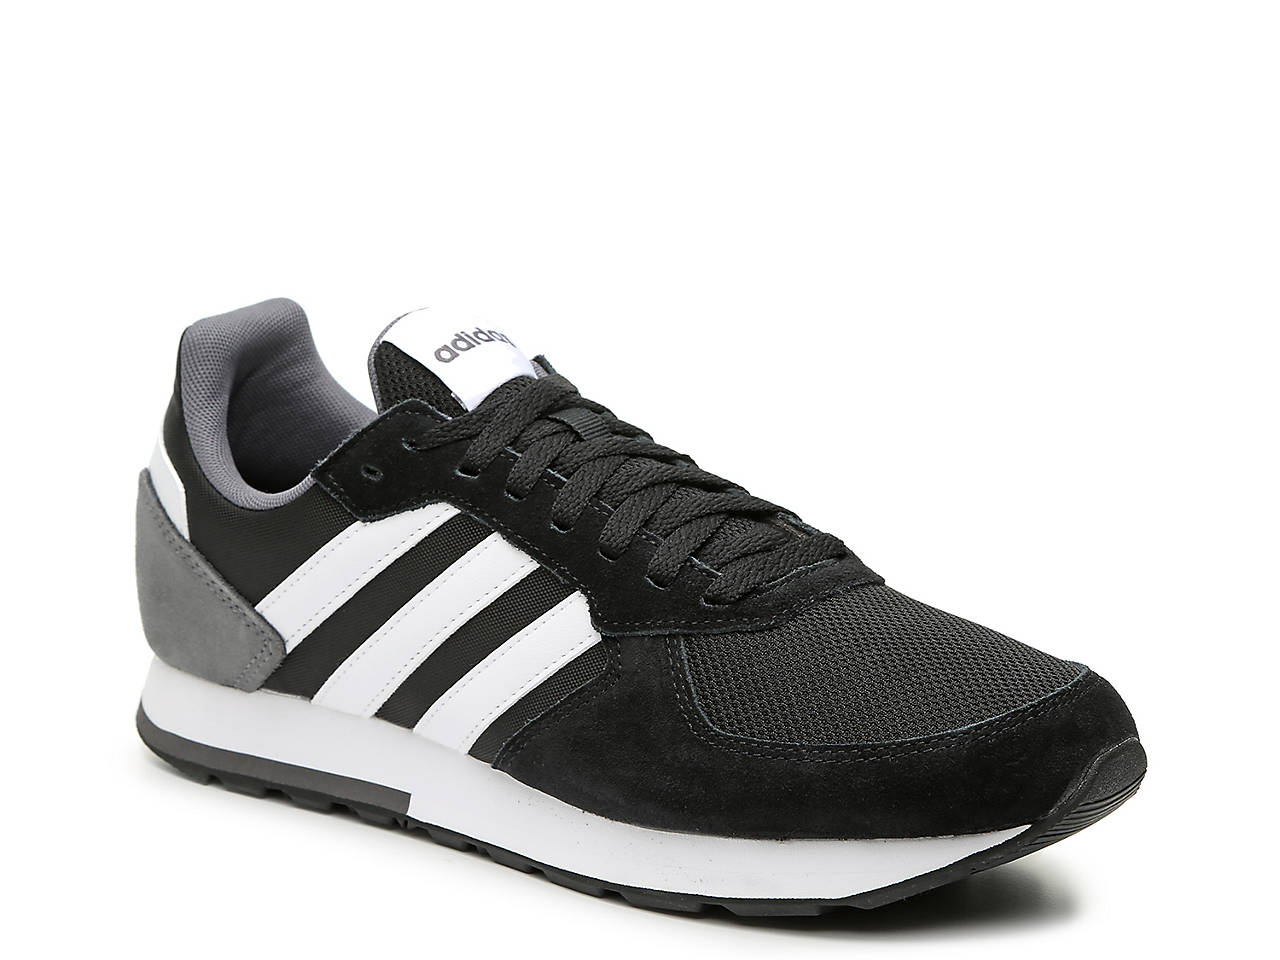 8K Retro Sneaker Men's